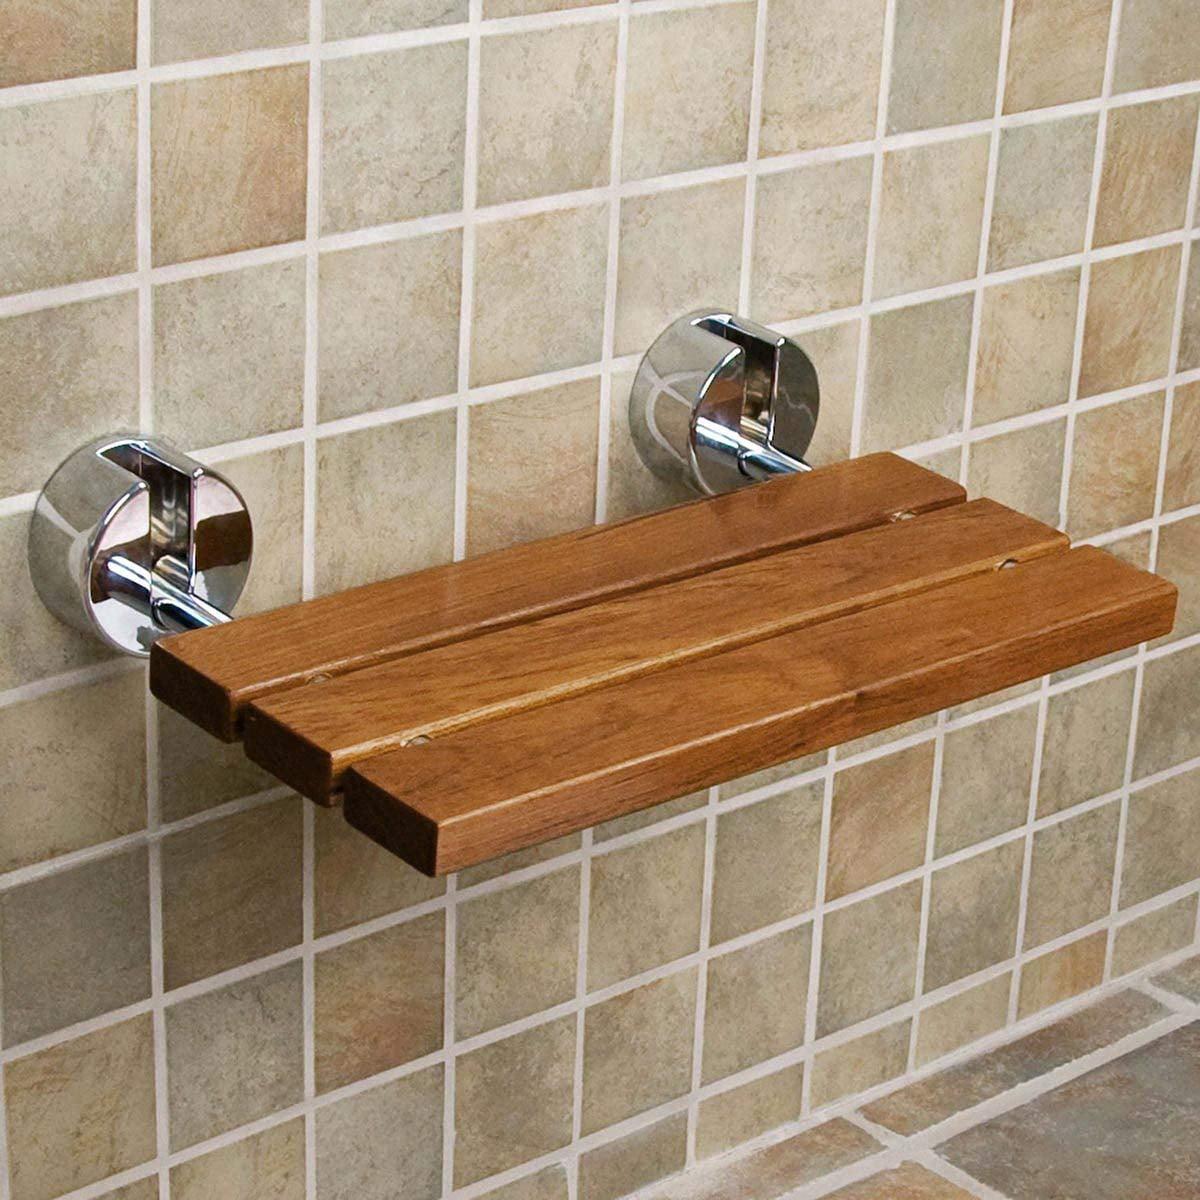 Clevr 20 Teak Modern Folding Shower Seat Bench Dark Wood Medical Wall Mount Walmart Com Walmart Com